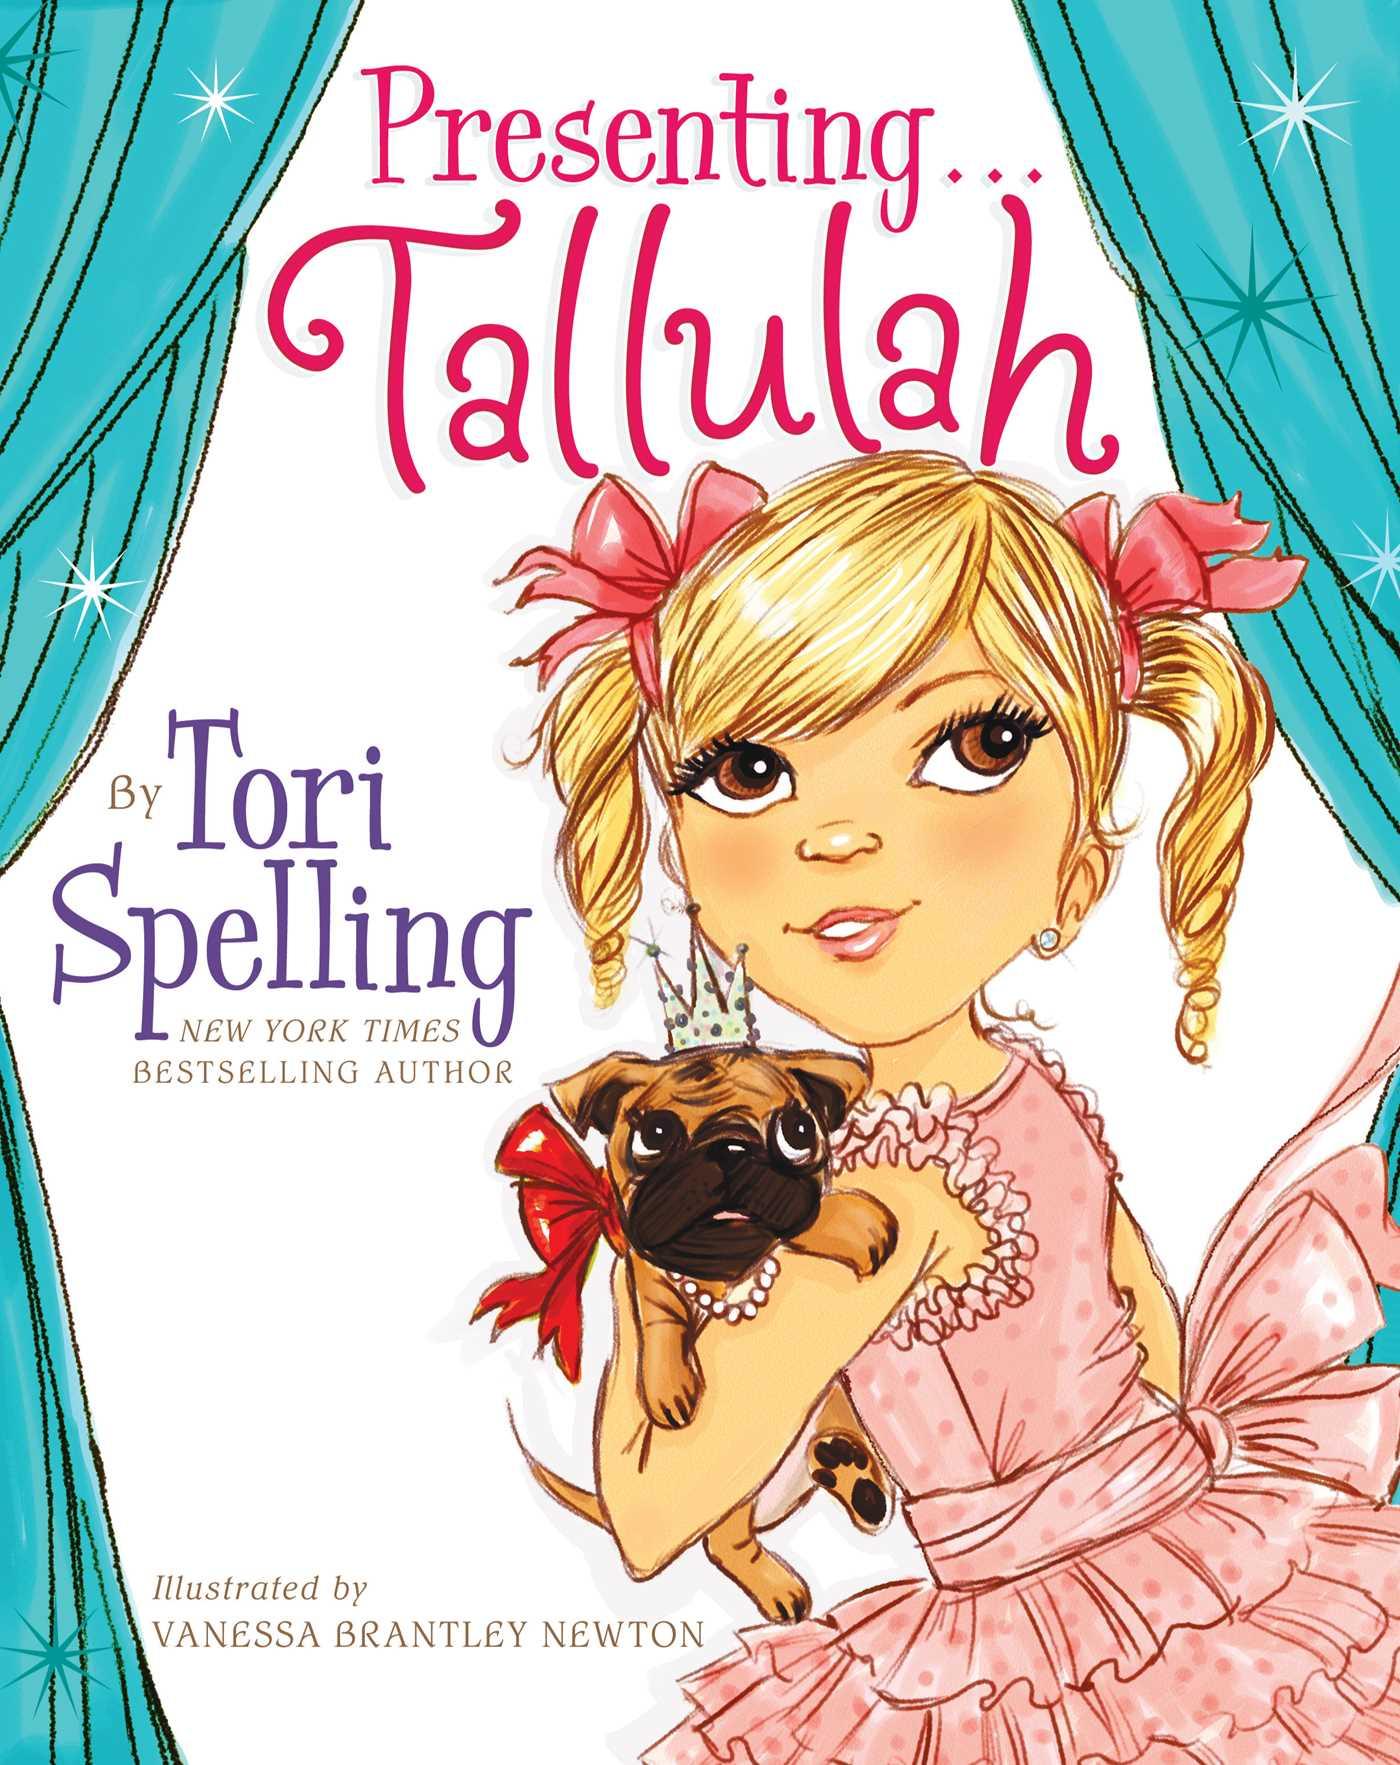 Presenting tallulah 9781442435315 hr